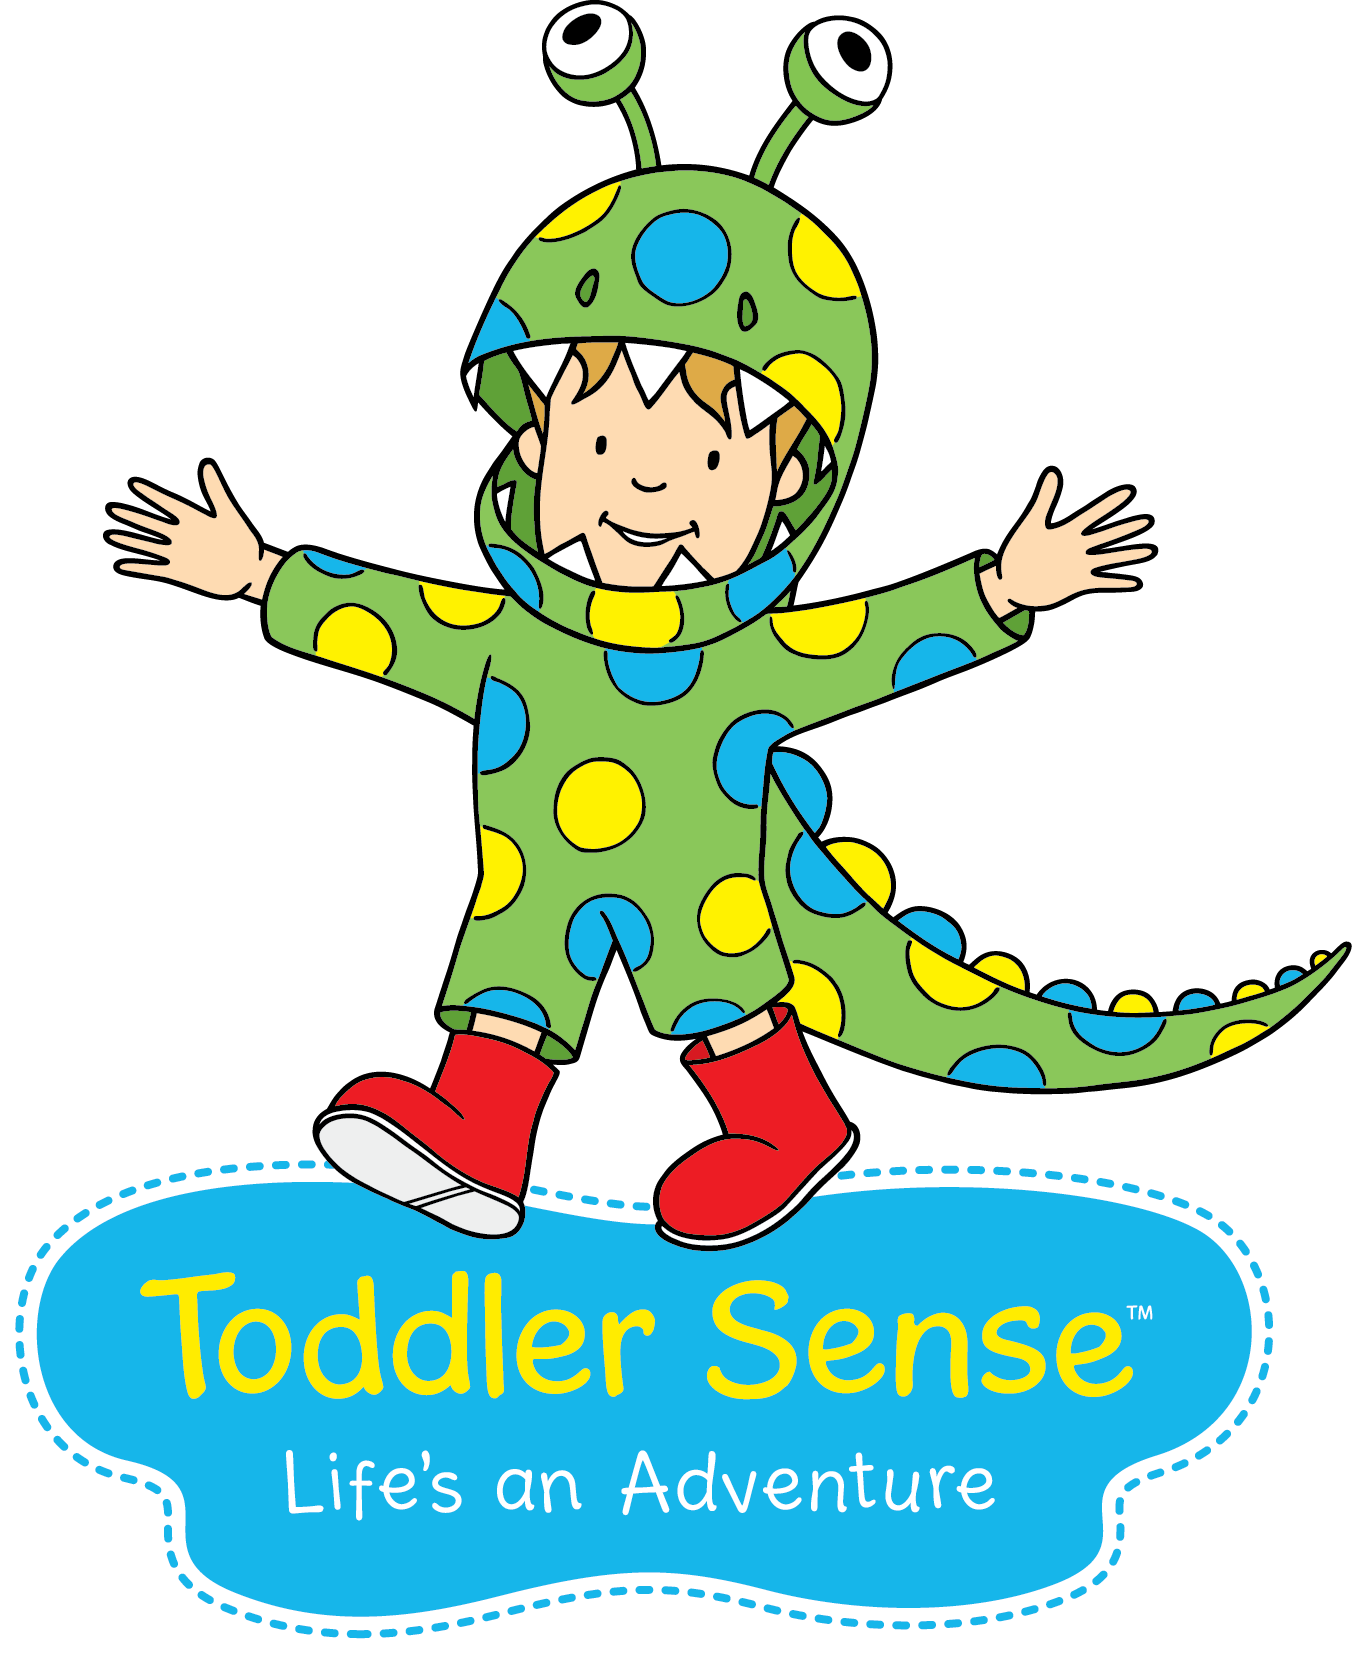 Toddler Sense Dundee's logo